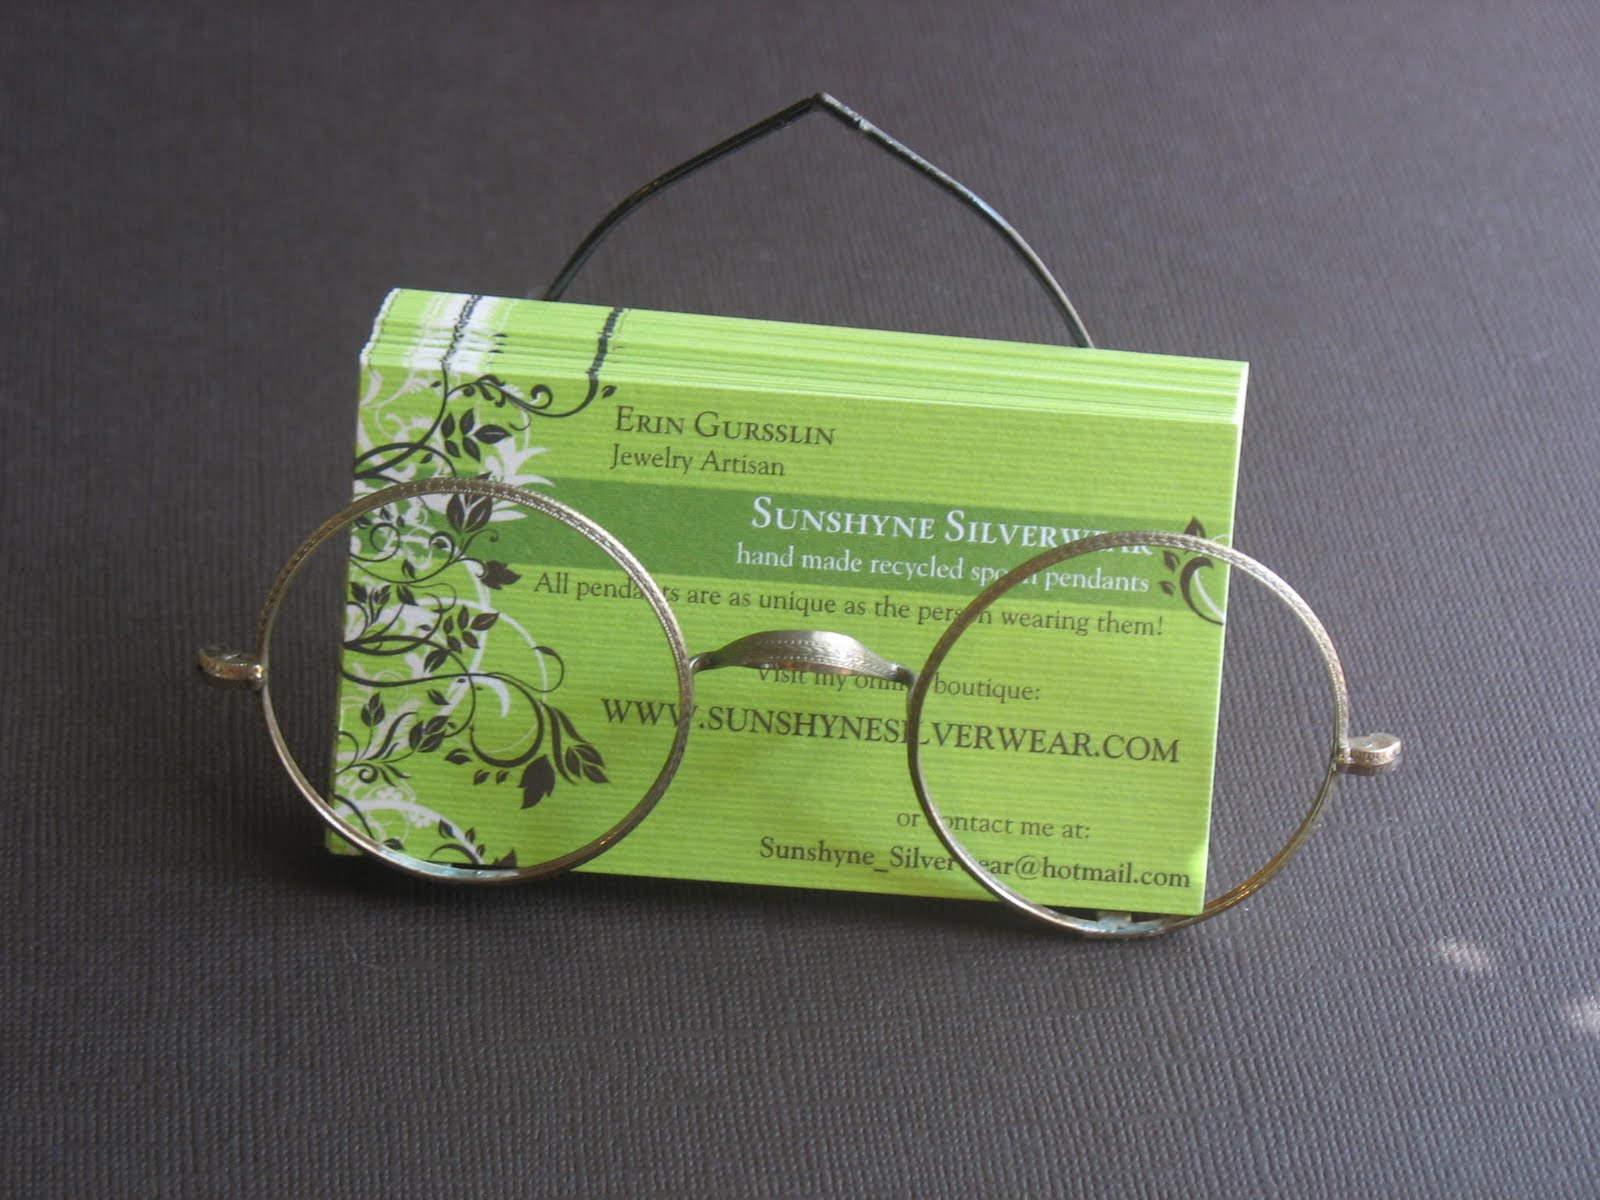 Sunshyne Silverwear NEW Eco friendly business card holders